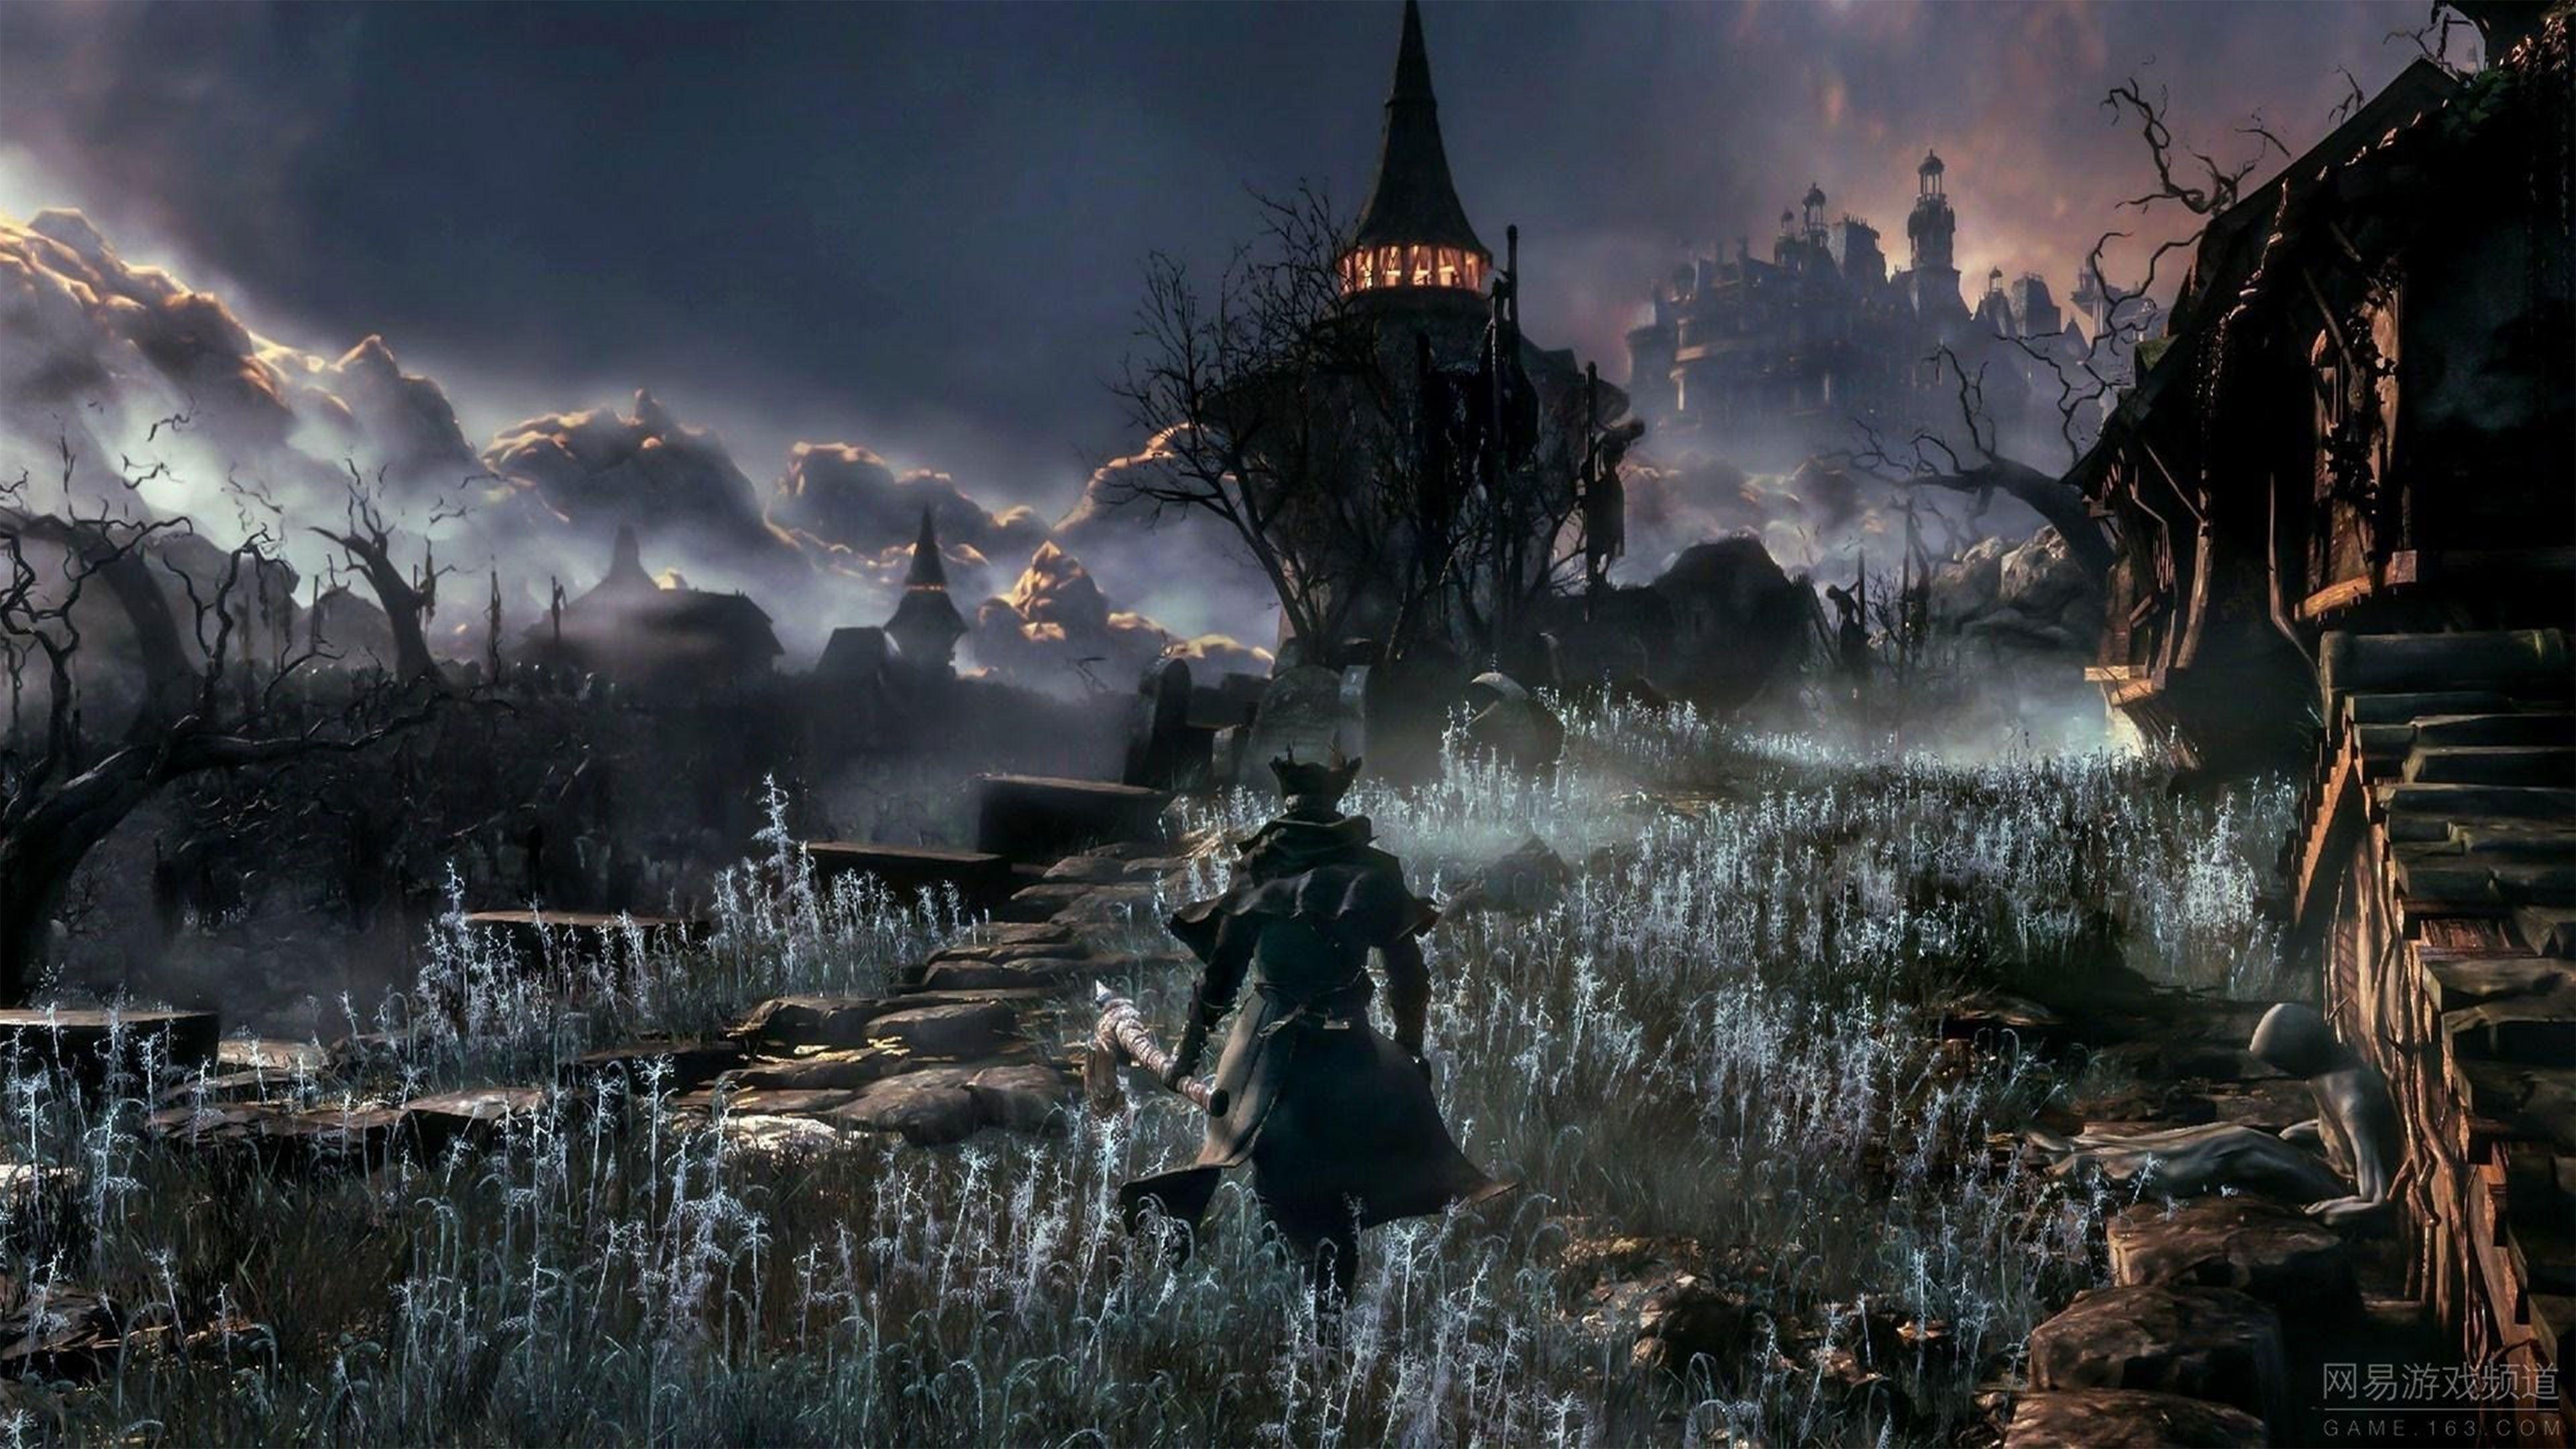 Dark Souls 3 Wallpapers Top Free Dark Souls 3 Backgrounds Wallpaperaccess